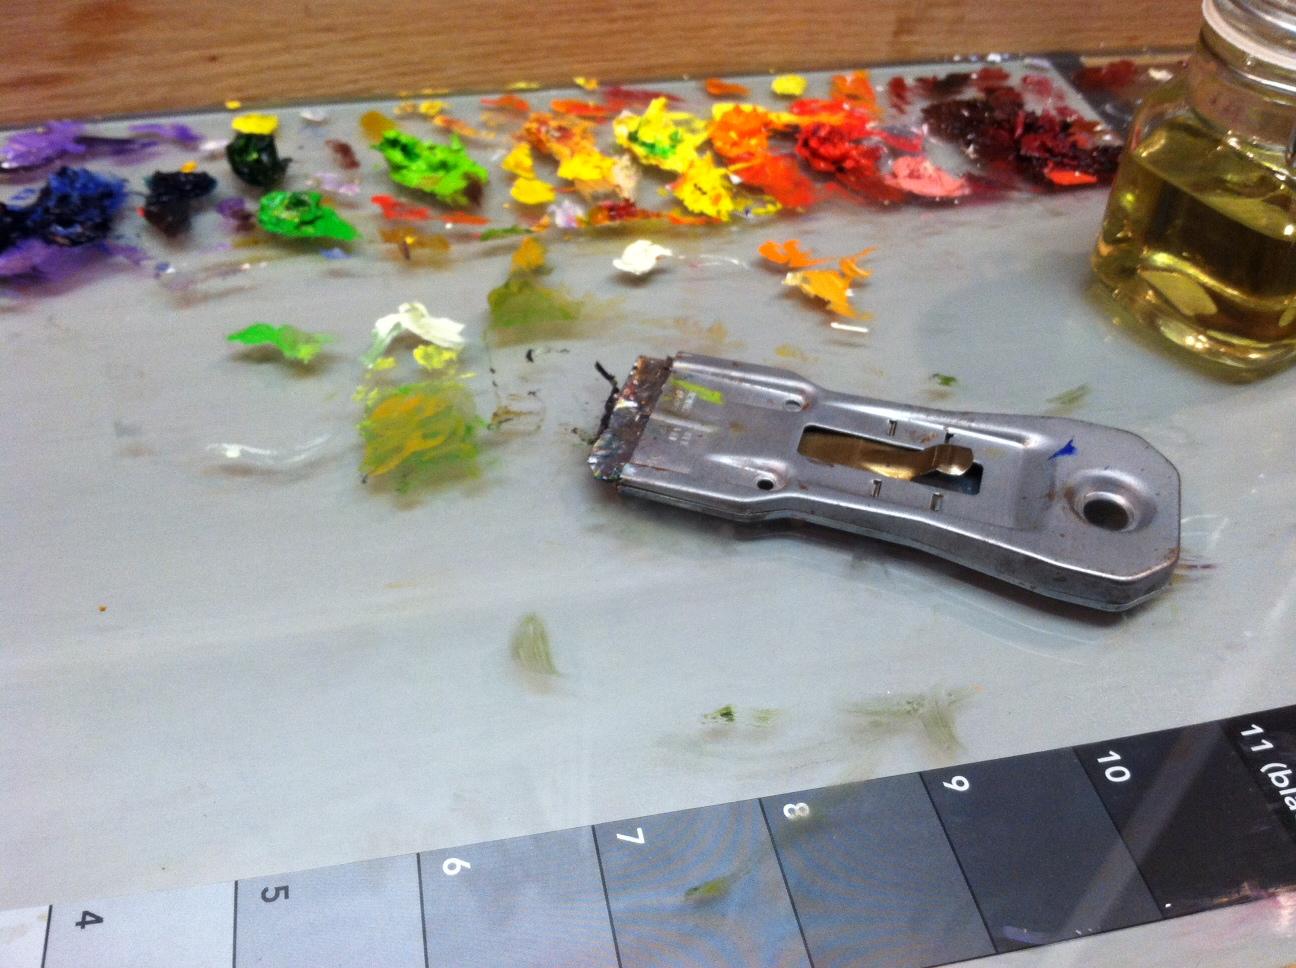 Studio Equipment: Glass